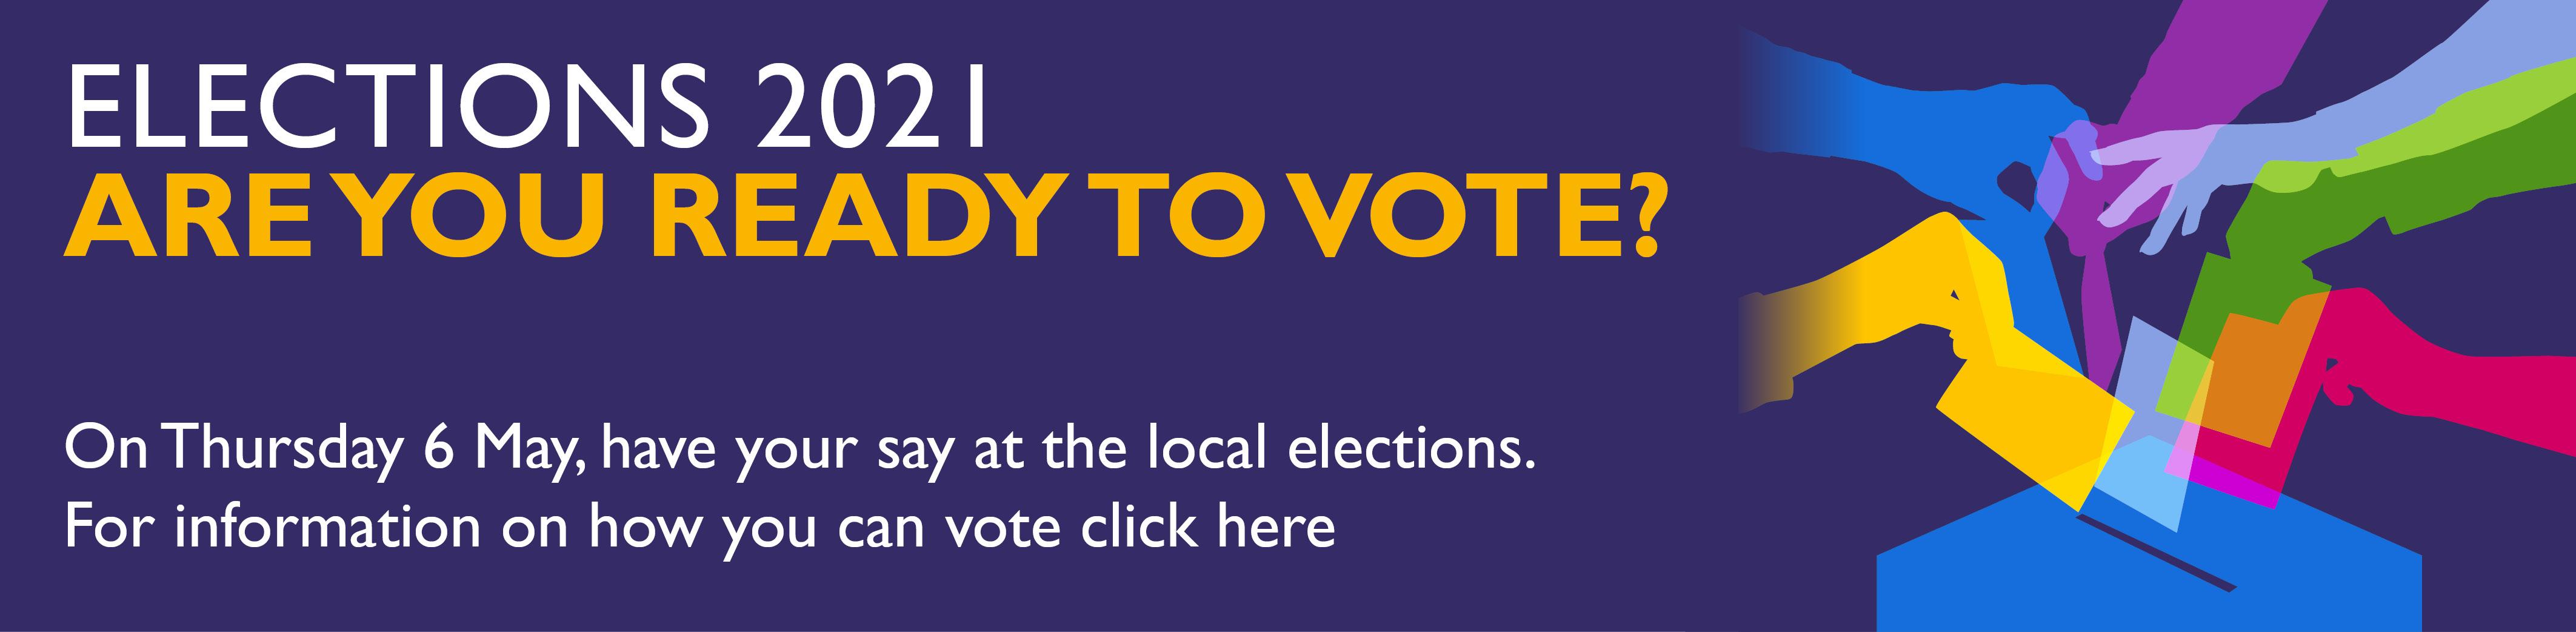 Voting 2021 image